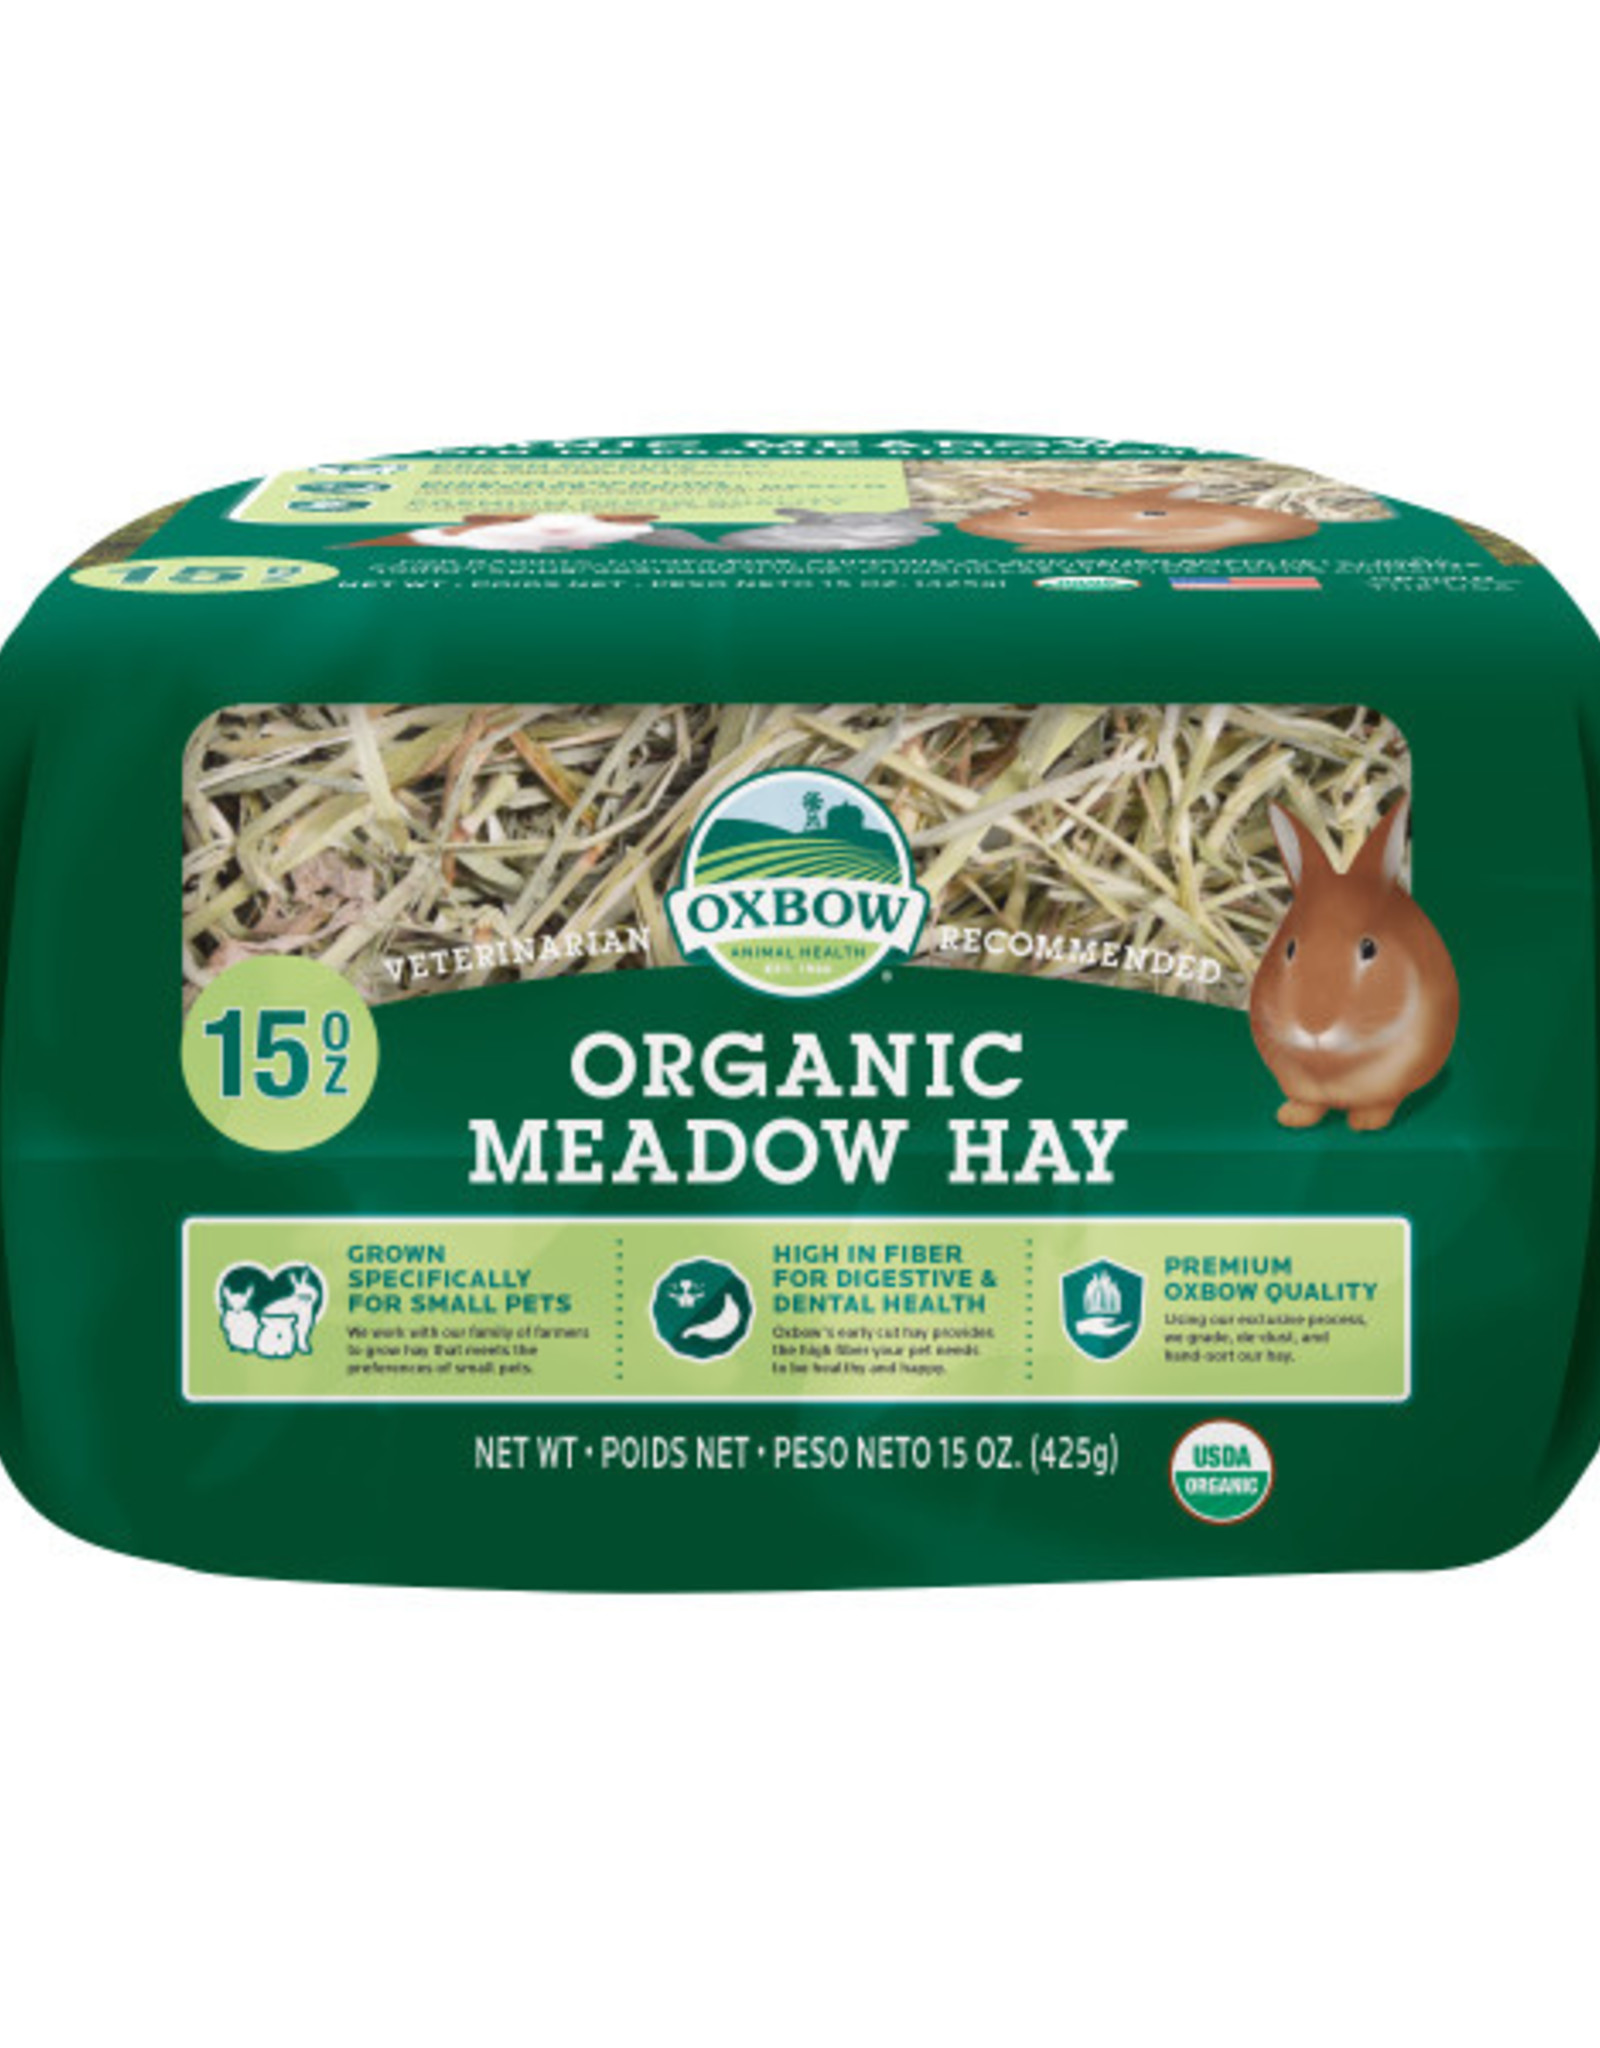 Oxbow Organic Meadow Hay 15 oz